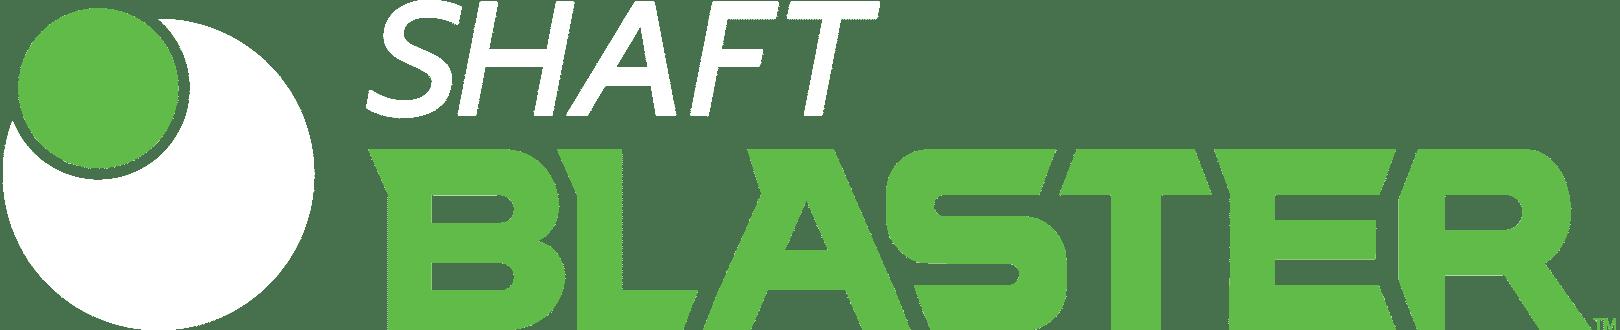 Shaft Blaster